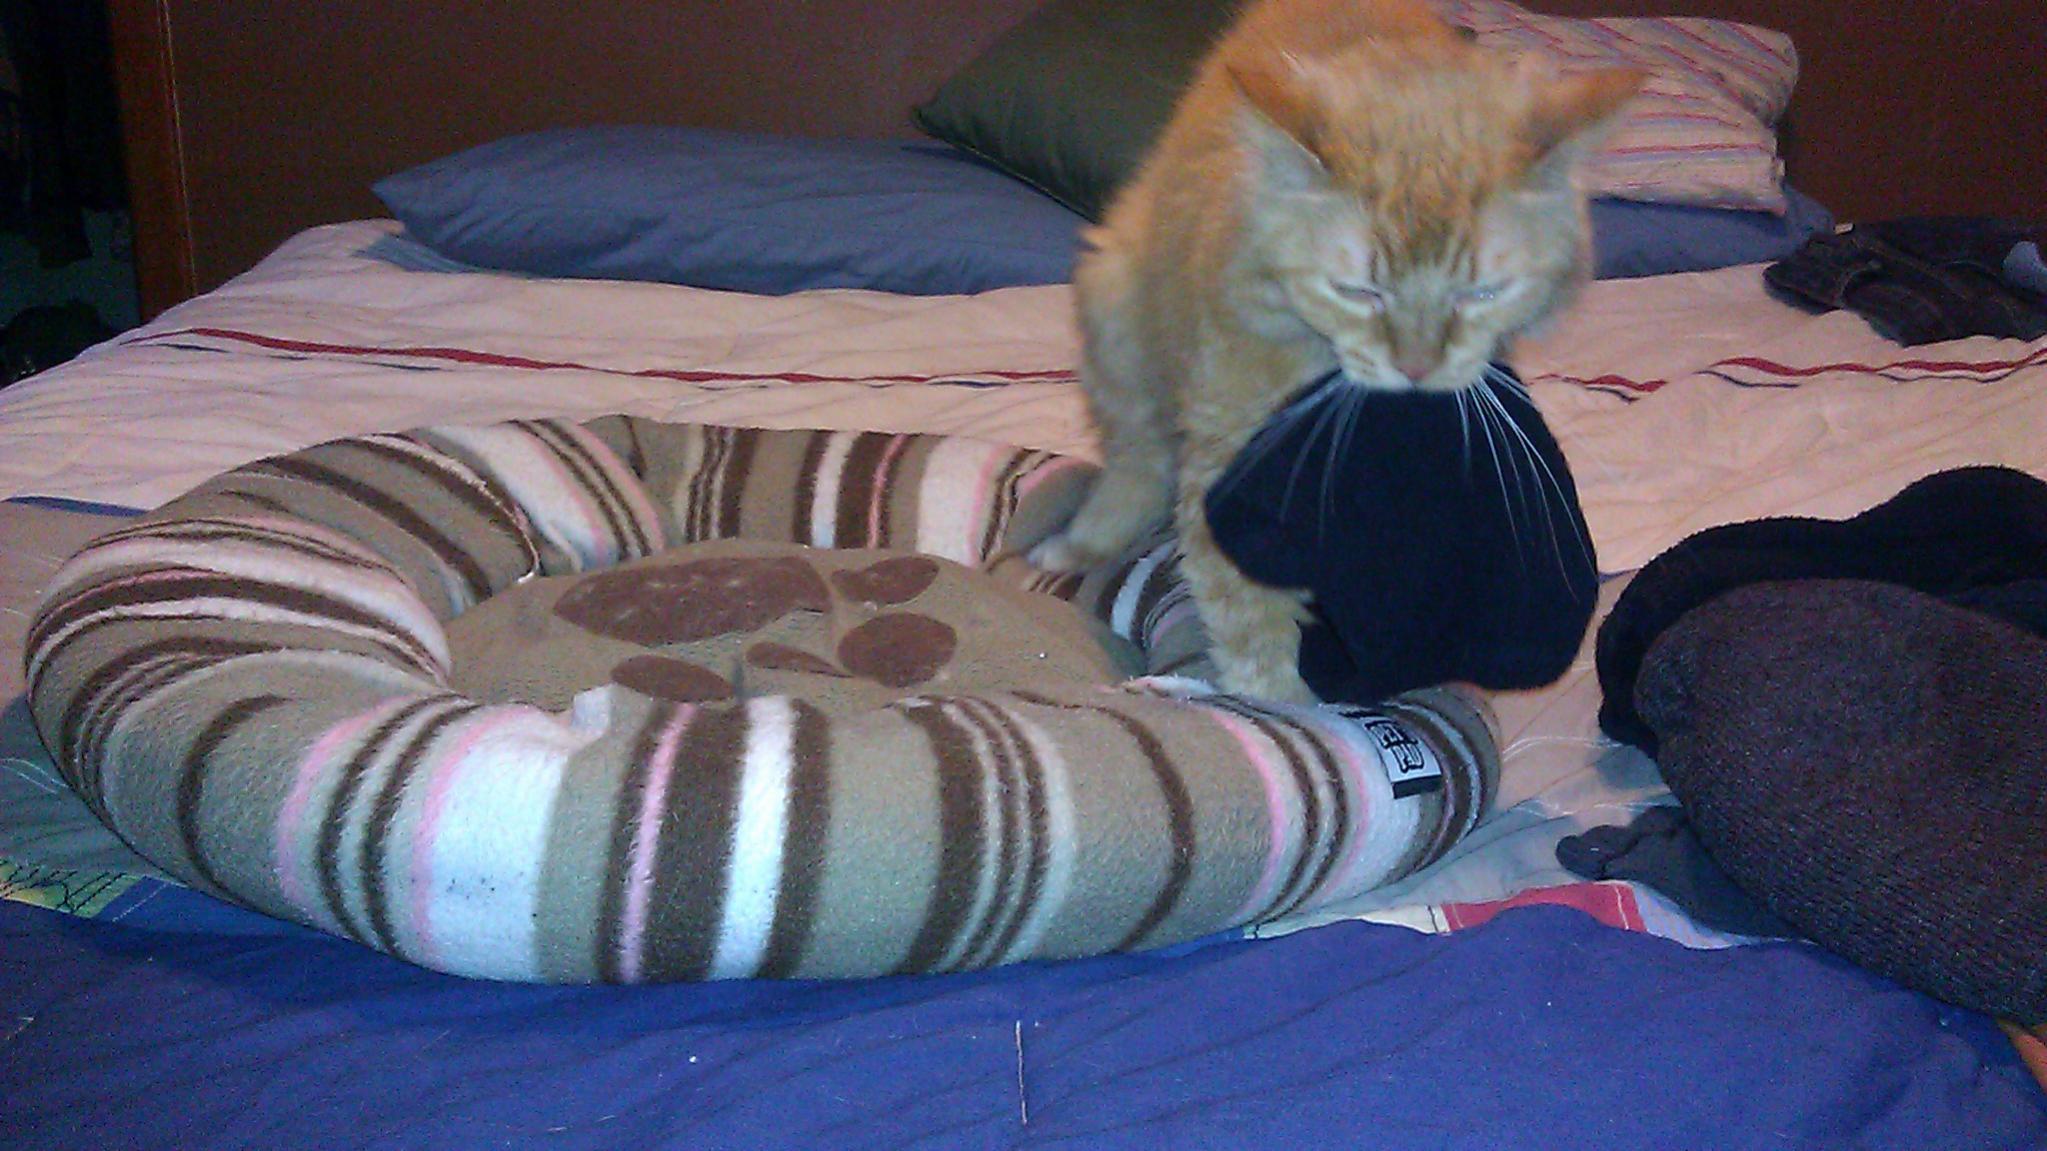 frisky cat-imag1787.jpg